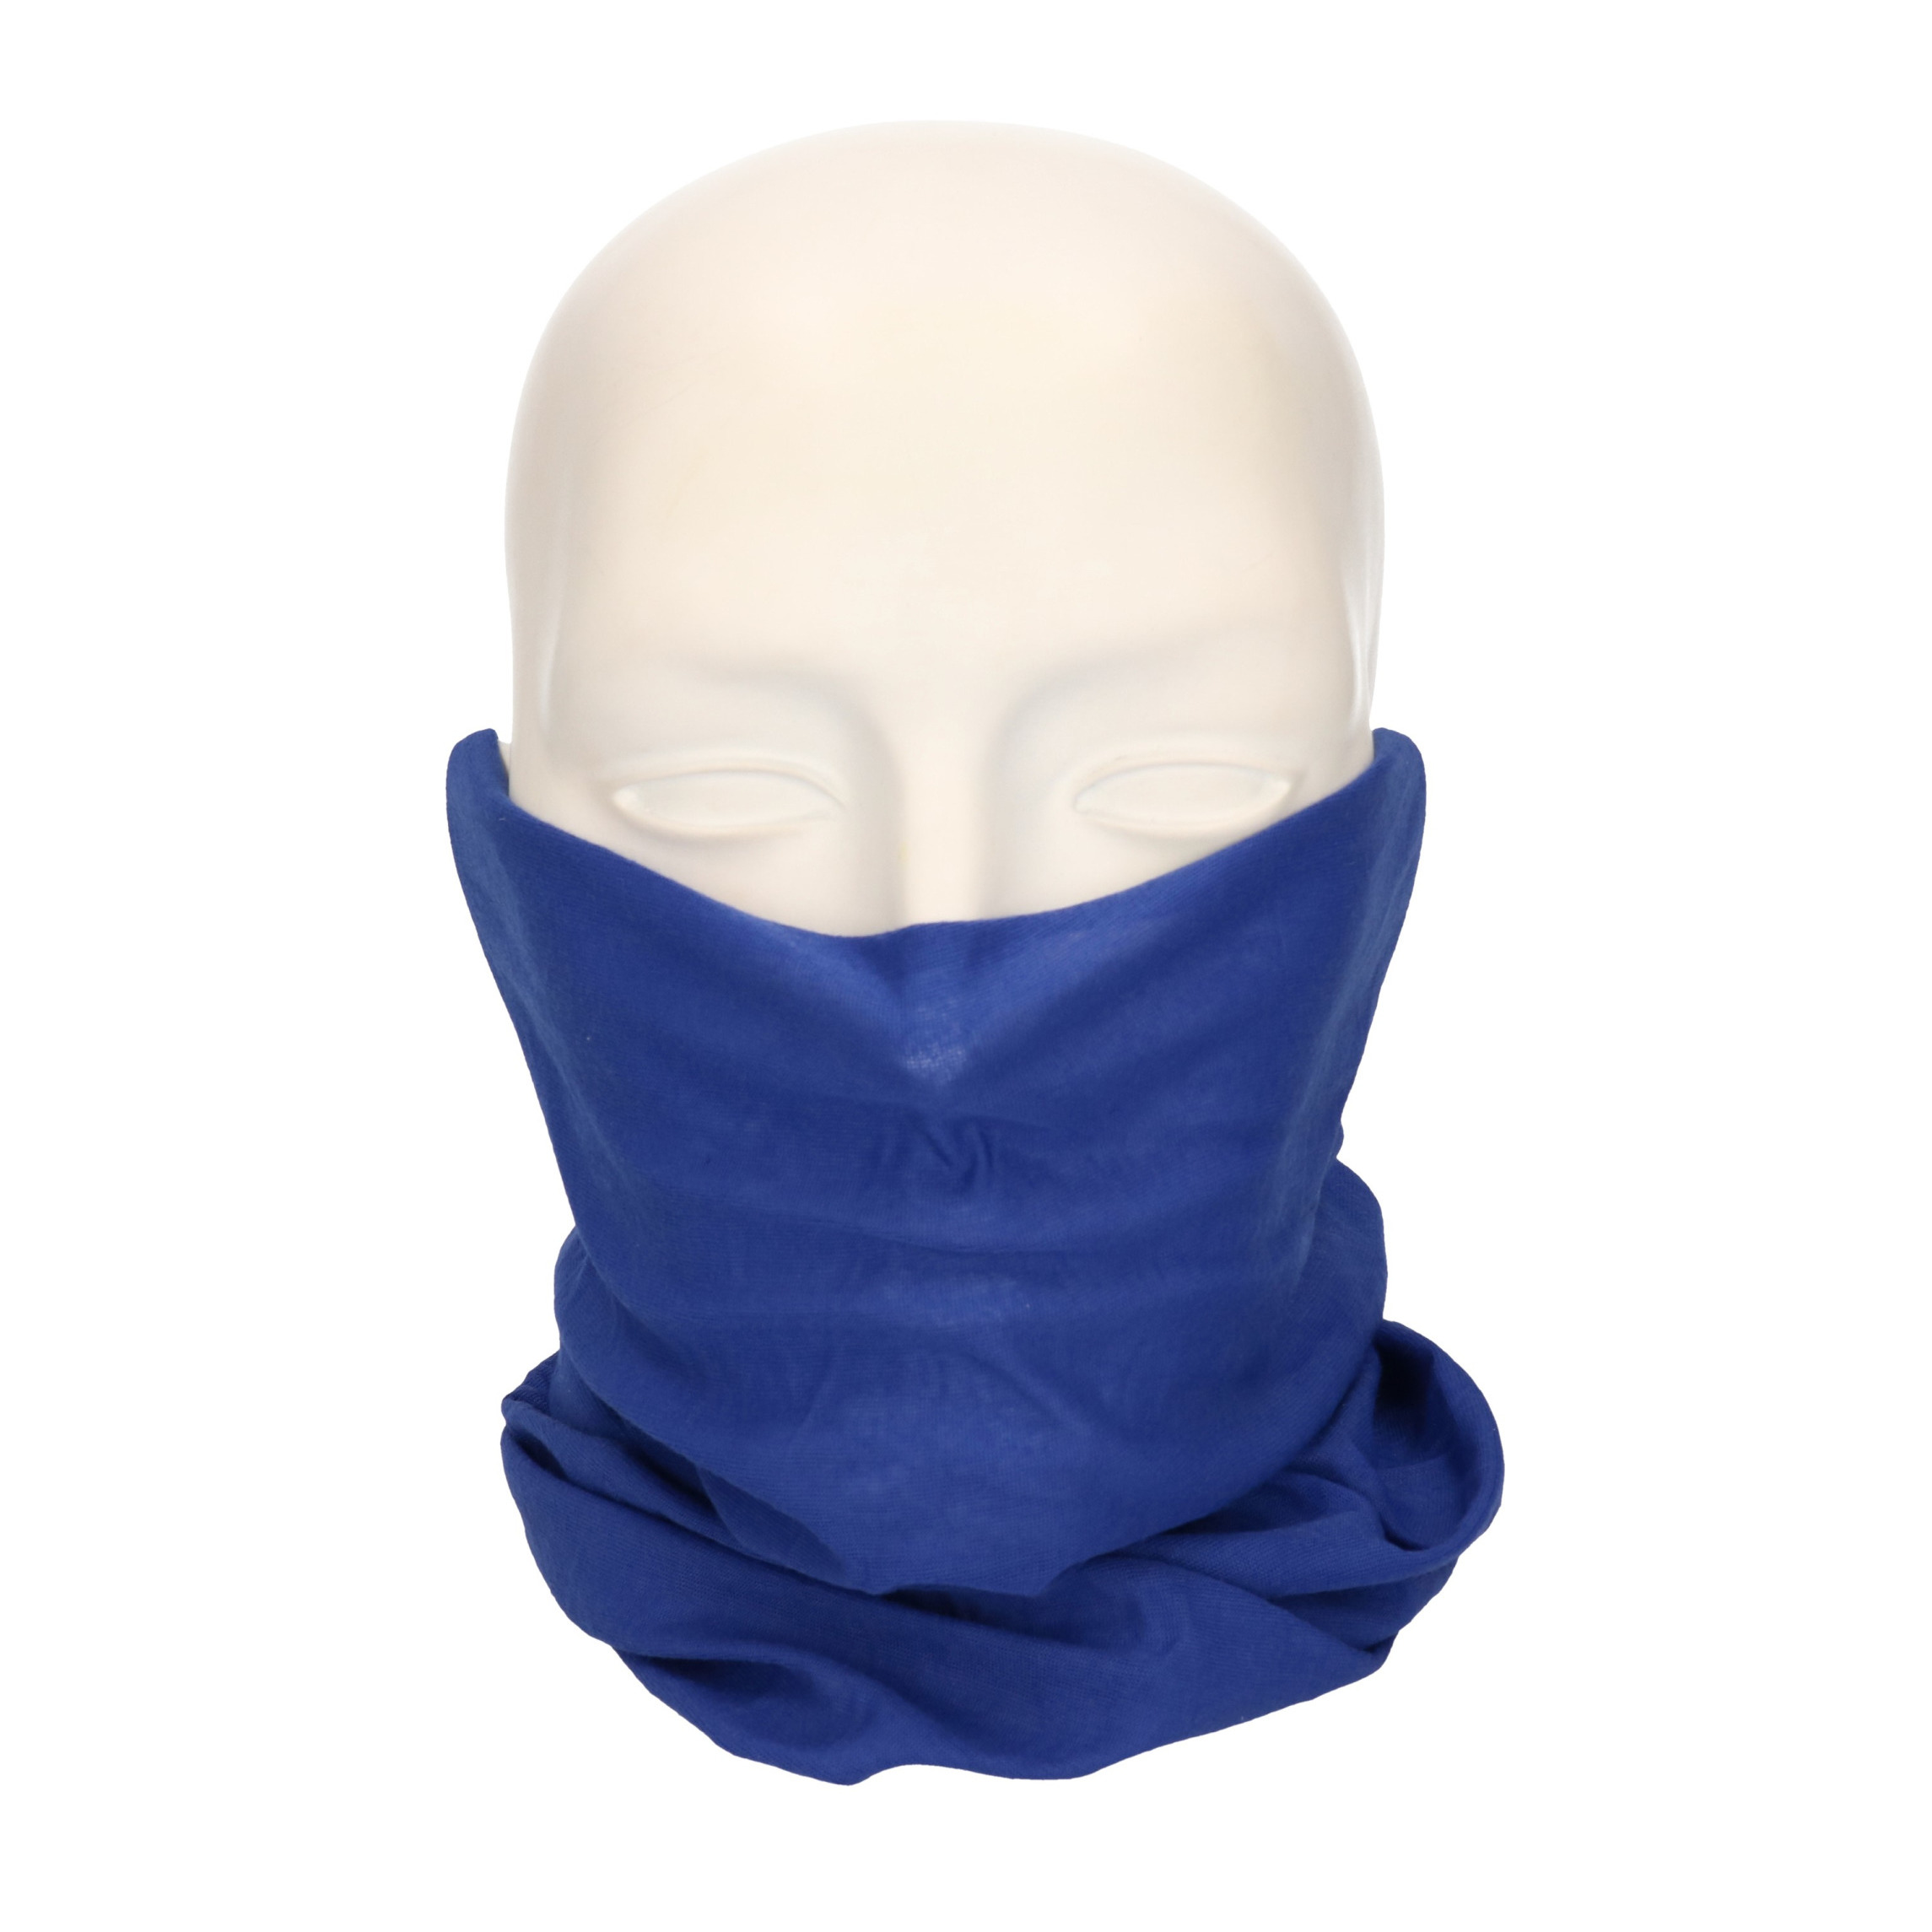 Multifunctionele morf sjaal indigo blauw